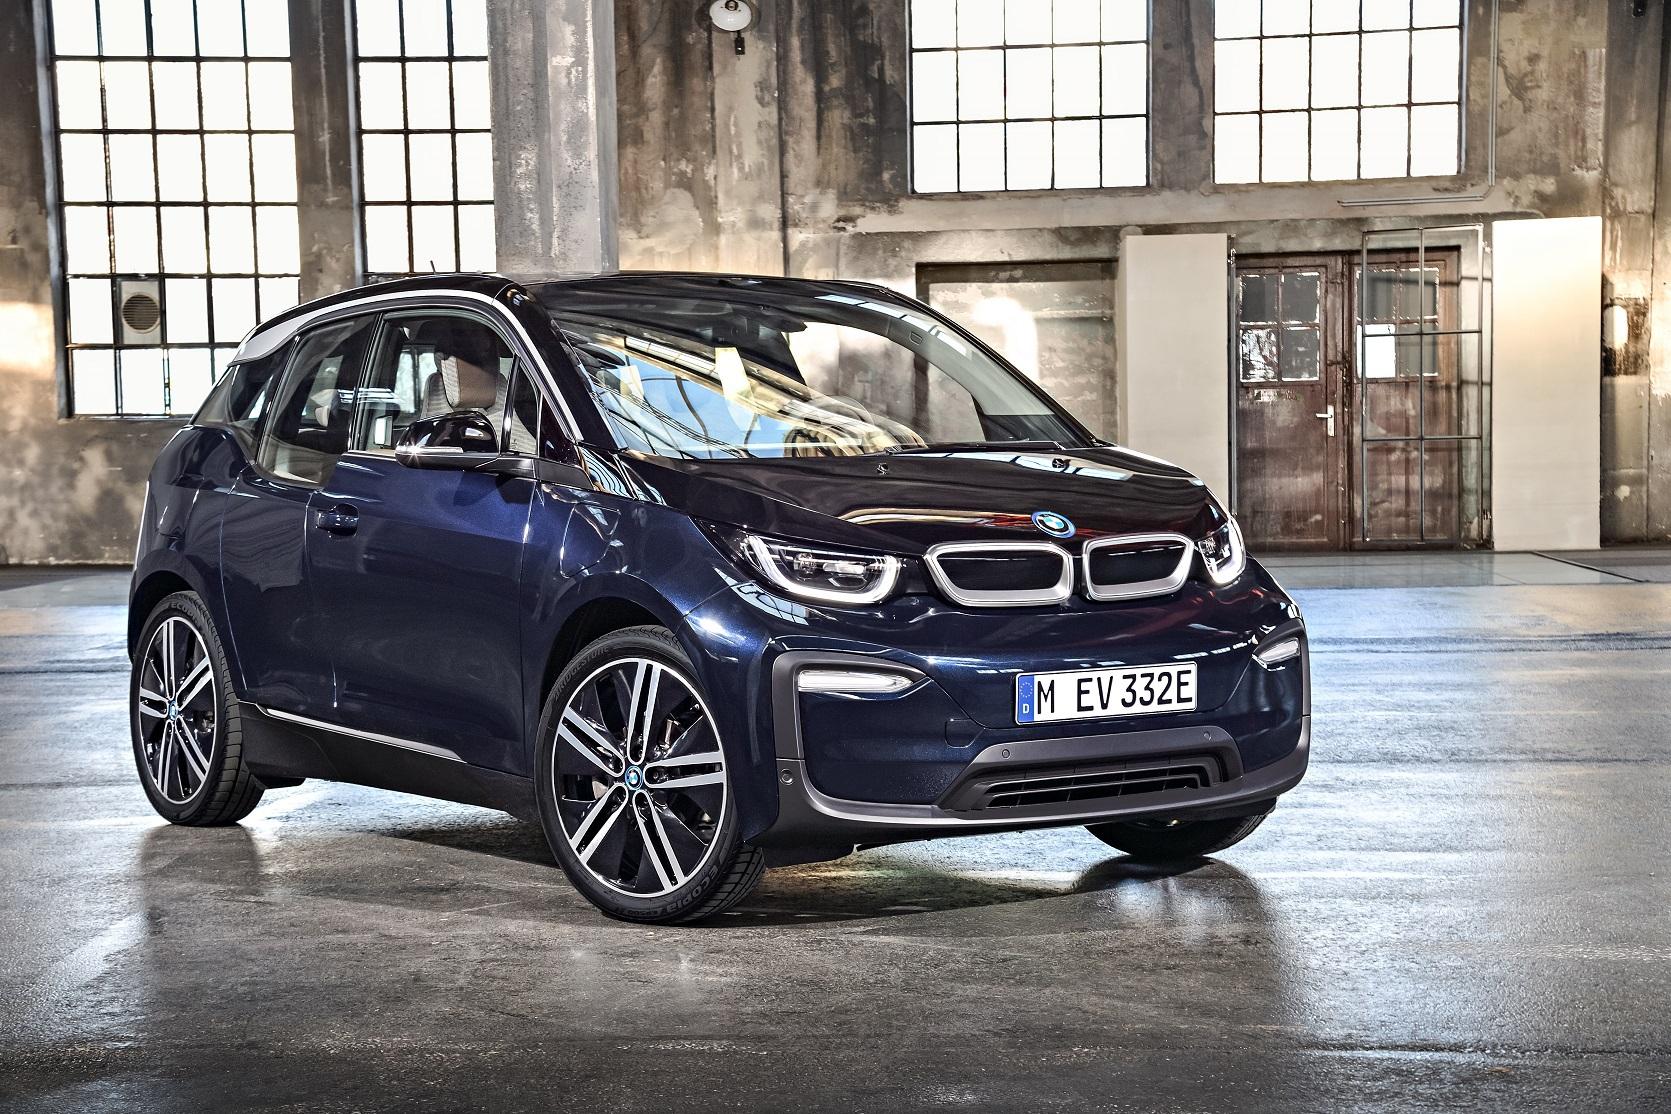 BMW i3がLCI!新車登録から8年/走行距離100,000km以内のバッテリー保証は嬉しいですね♪残念ながらスポーツモデル「i3s」は導入なし><